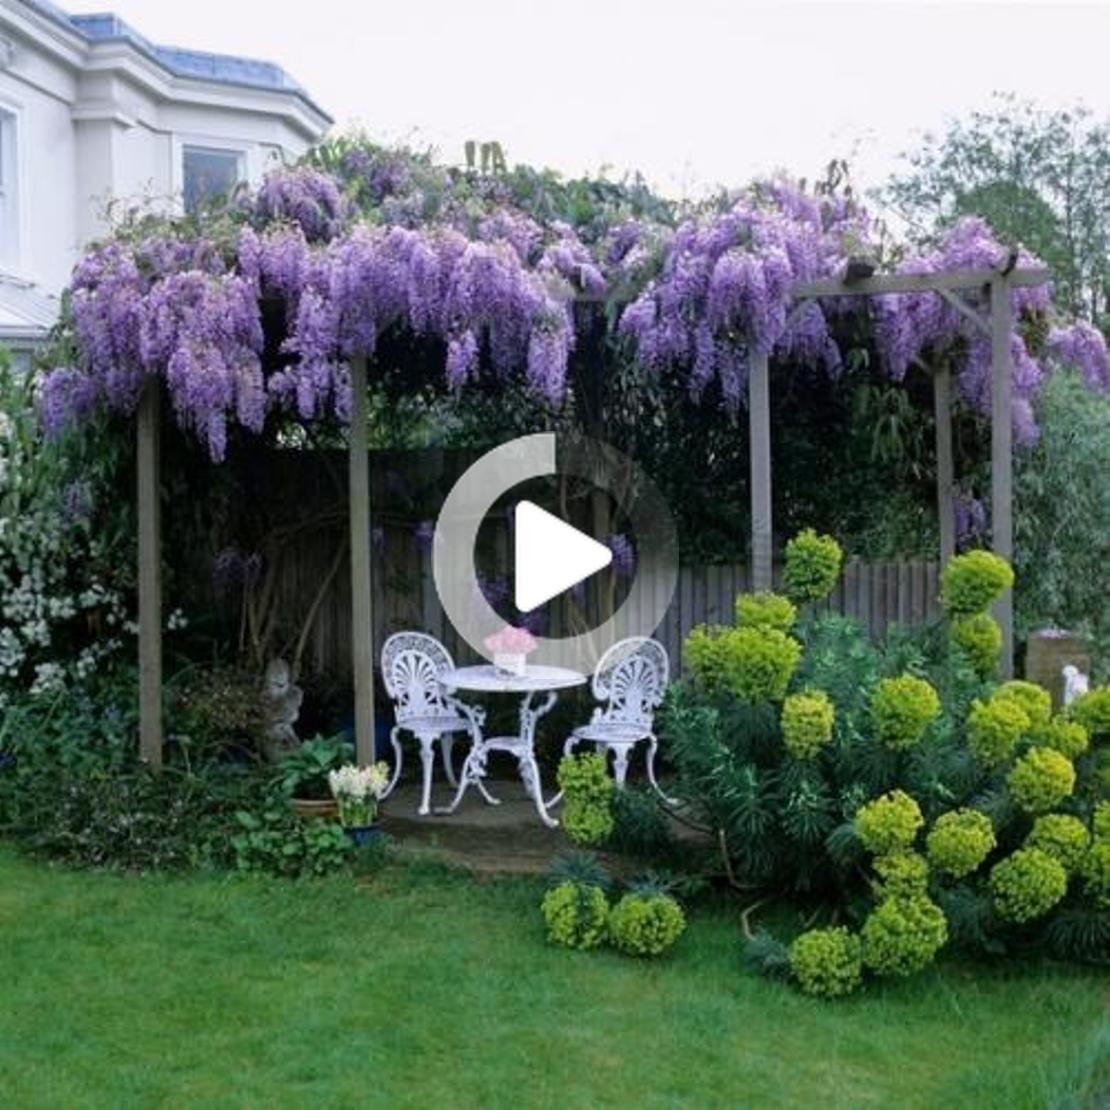 Superbes Plantes De Jardin De Glycine Glyzinie Gartenpflanzen Lila Bluten